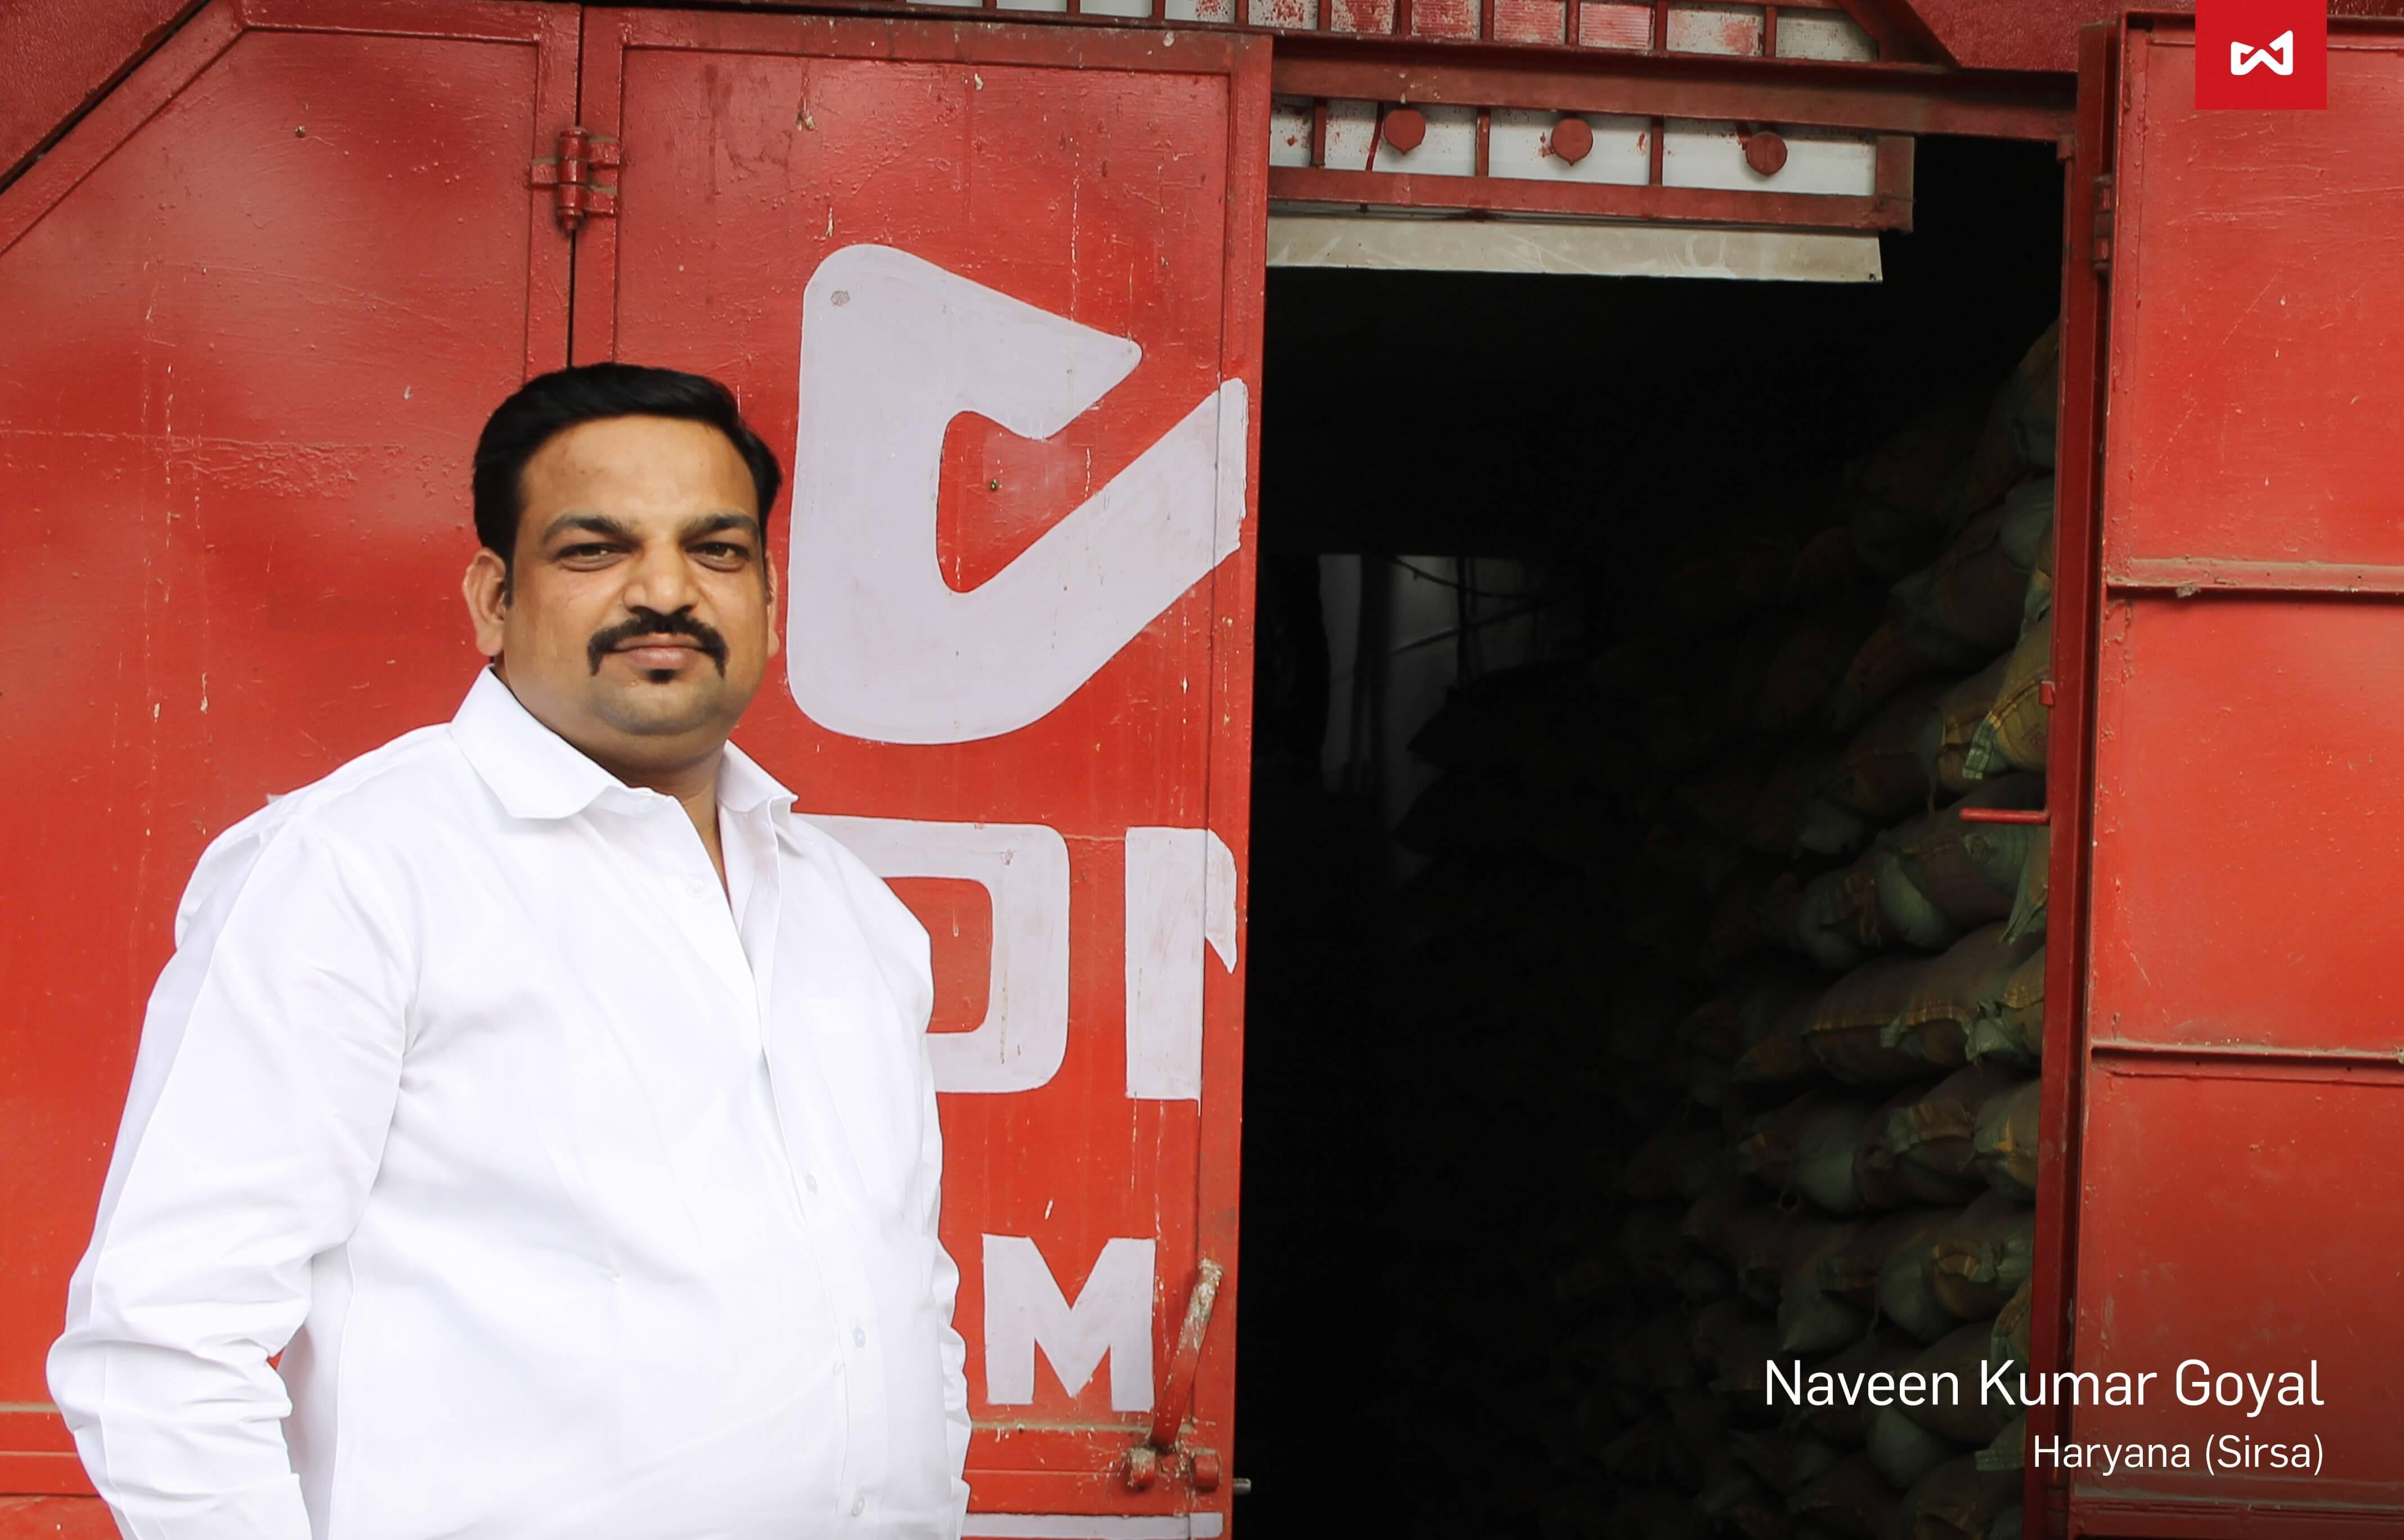 Naveen Kumar Goyal